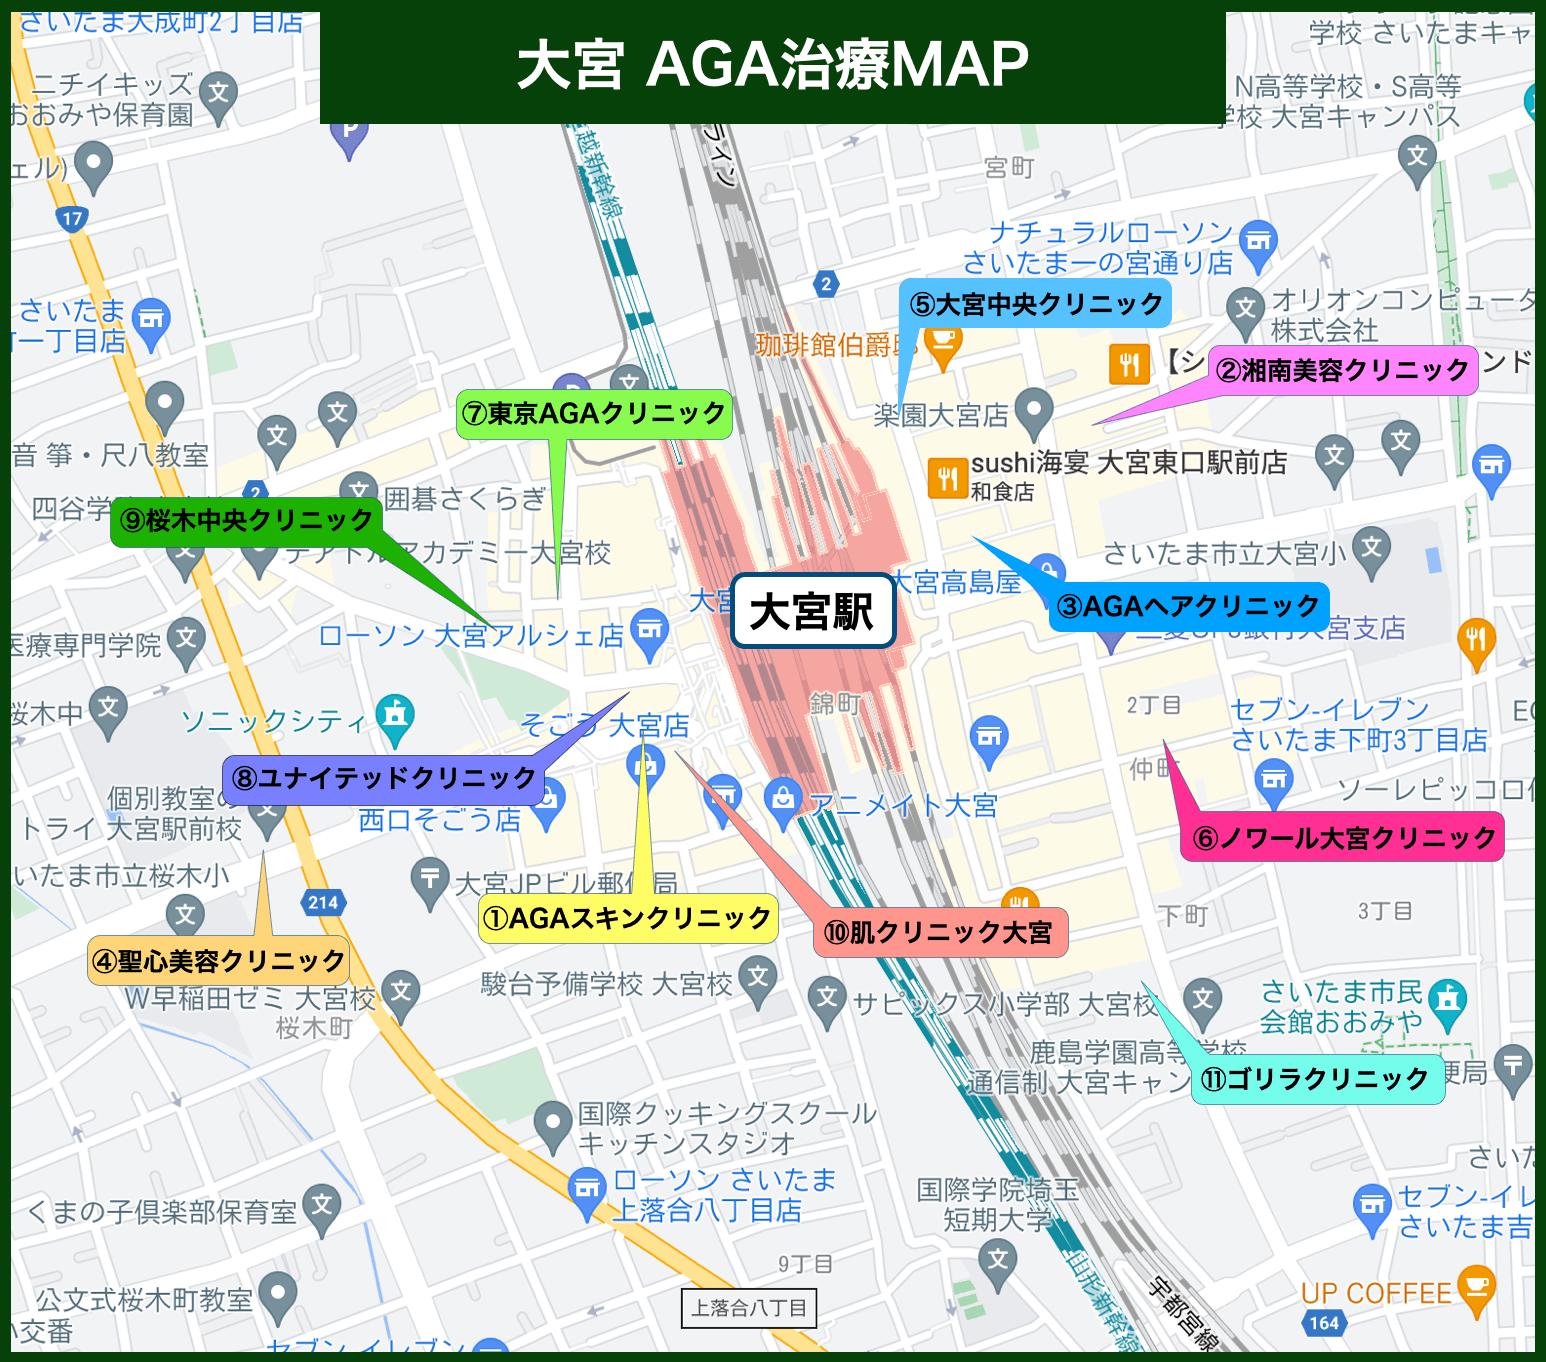 大宮AGA治療MAP